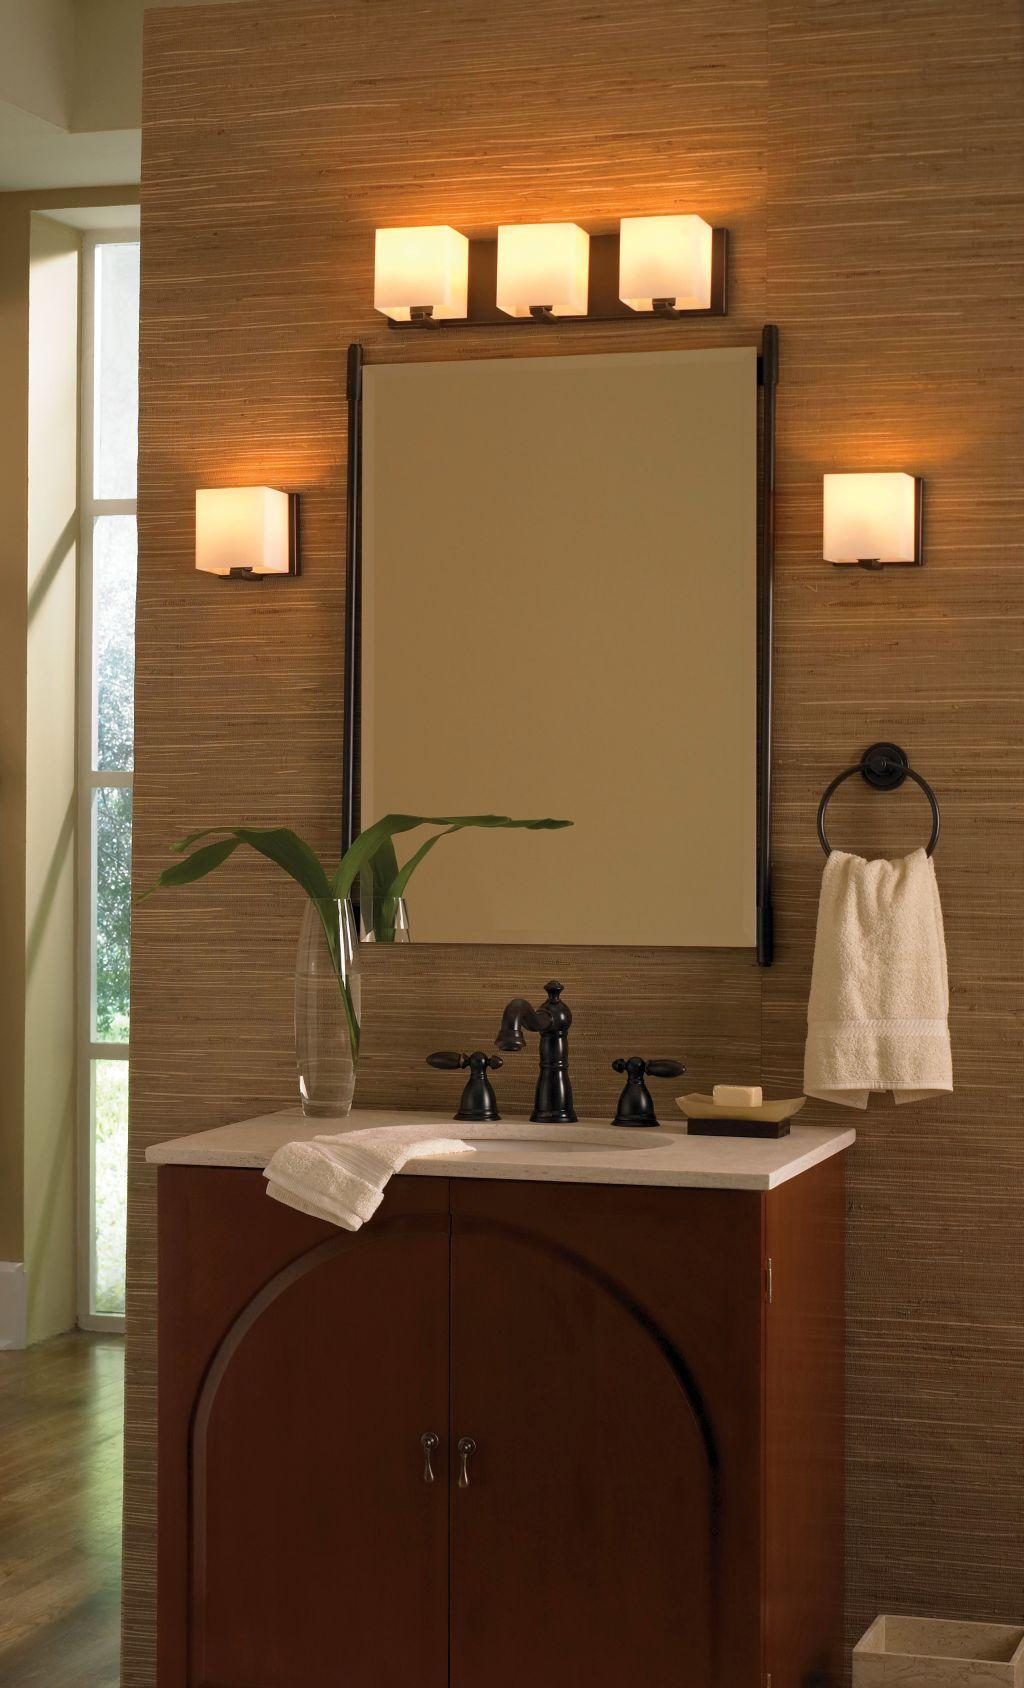 Retro bathroom vanity lighting ideas - Bathroom lighting ideas for vanity ...